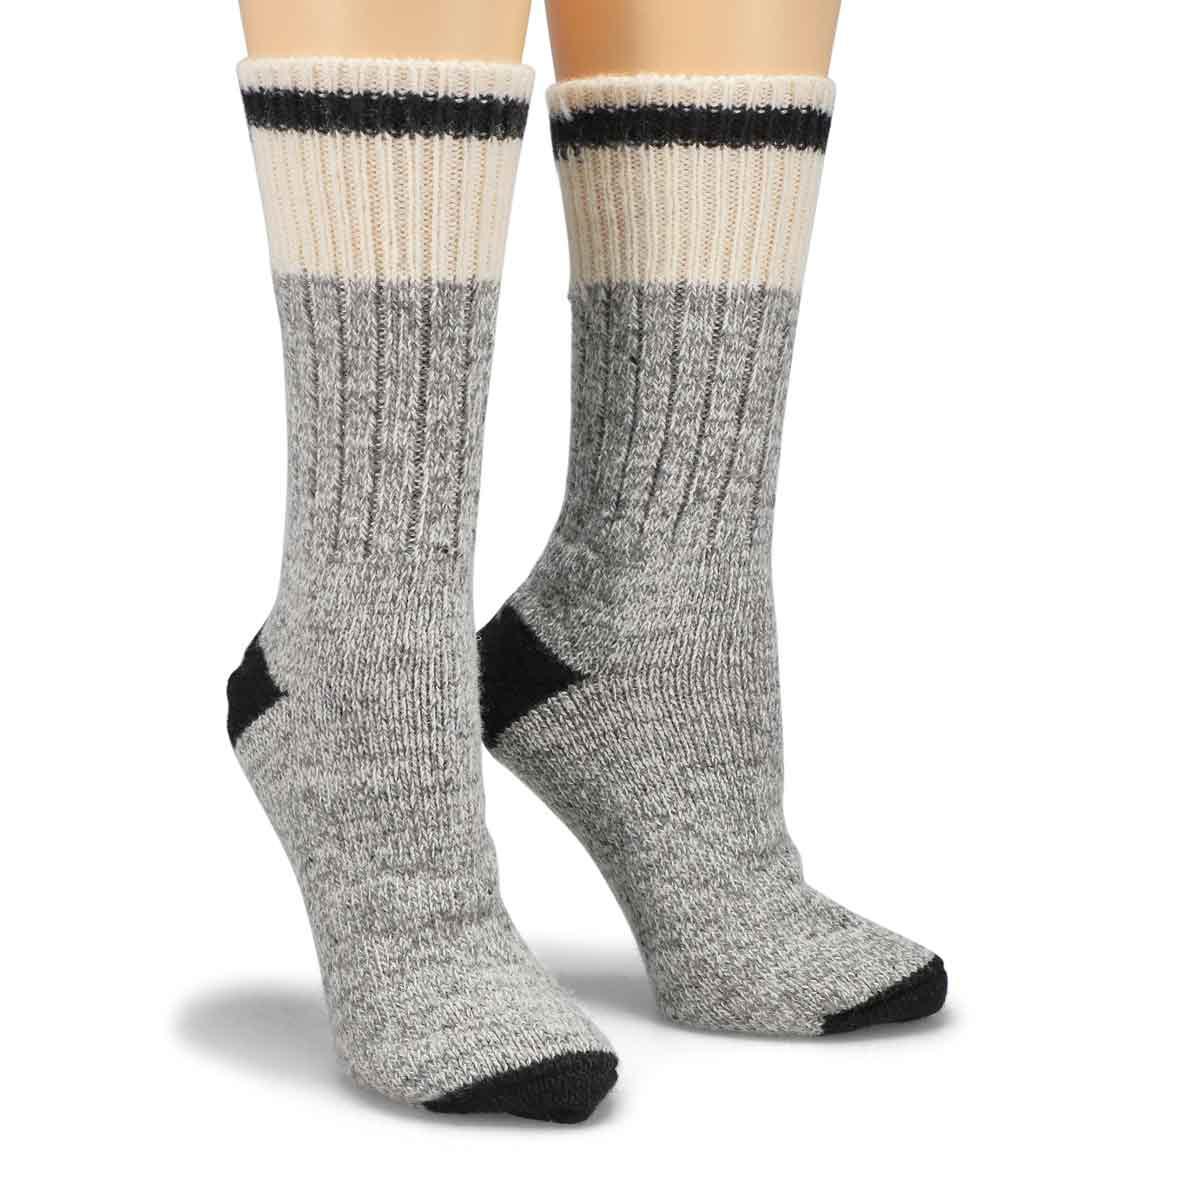 Women's Duray Wool Blend Sock - Grey/Black